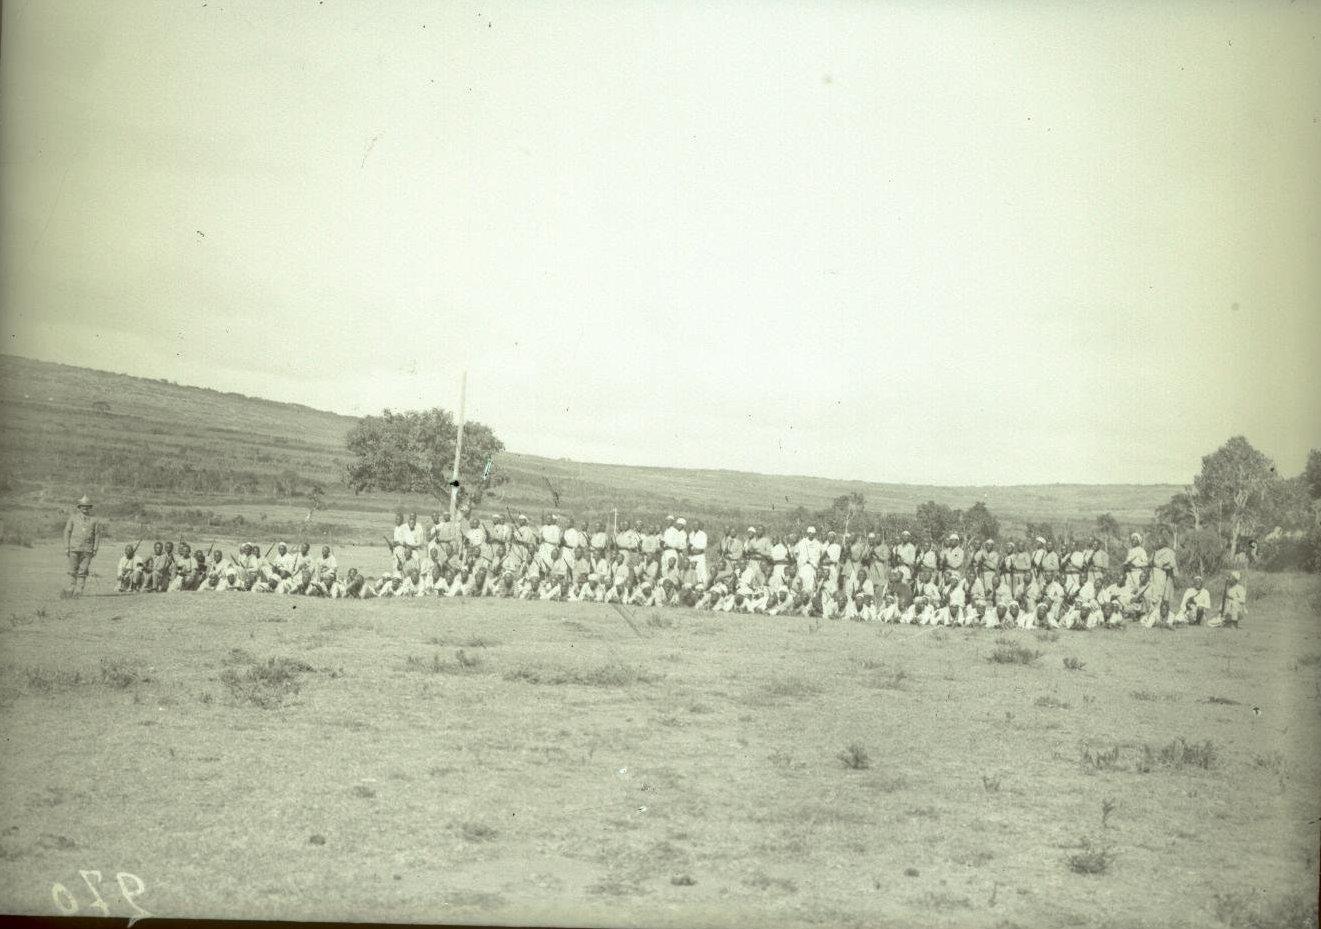 270. Абиссиния, провинция Харар, г. Харар. Солдаты-шанкала